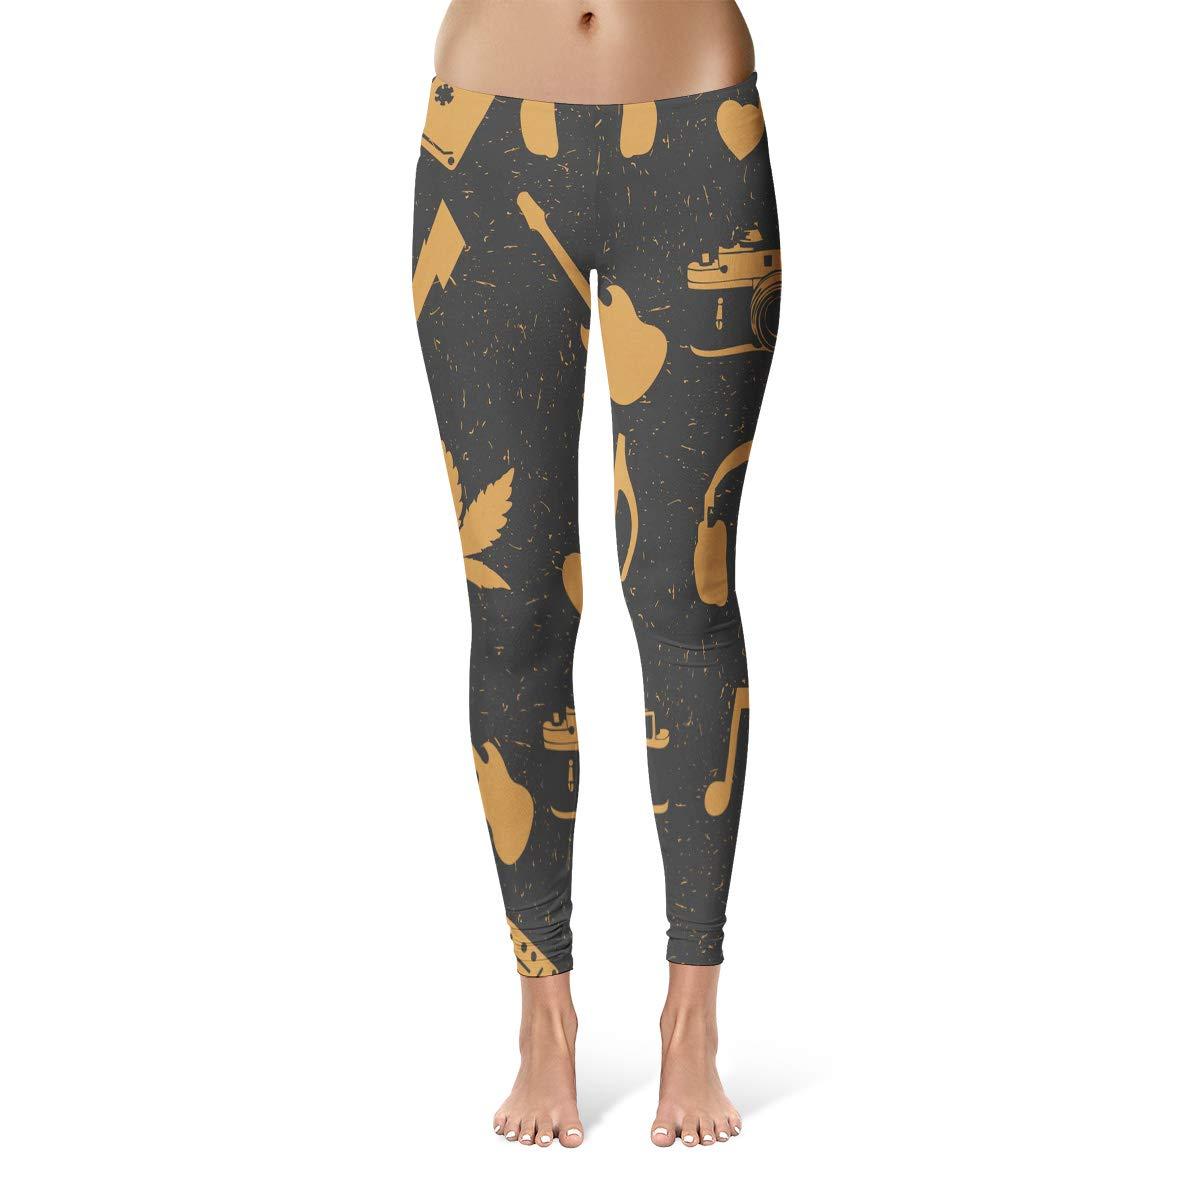 Tinmun Hippie Marijuana Leaves Headphones Old Camera Heart Guitar Music Leggings Skinny Pants for Women Yoga Running Gym